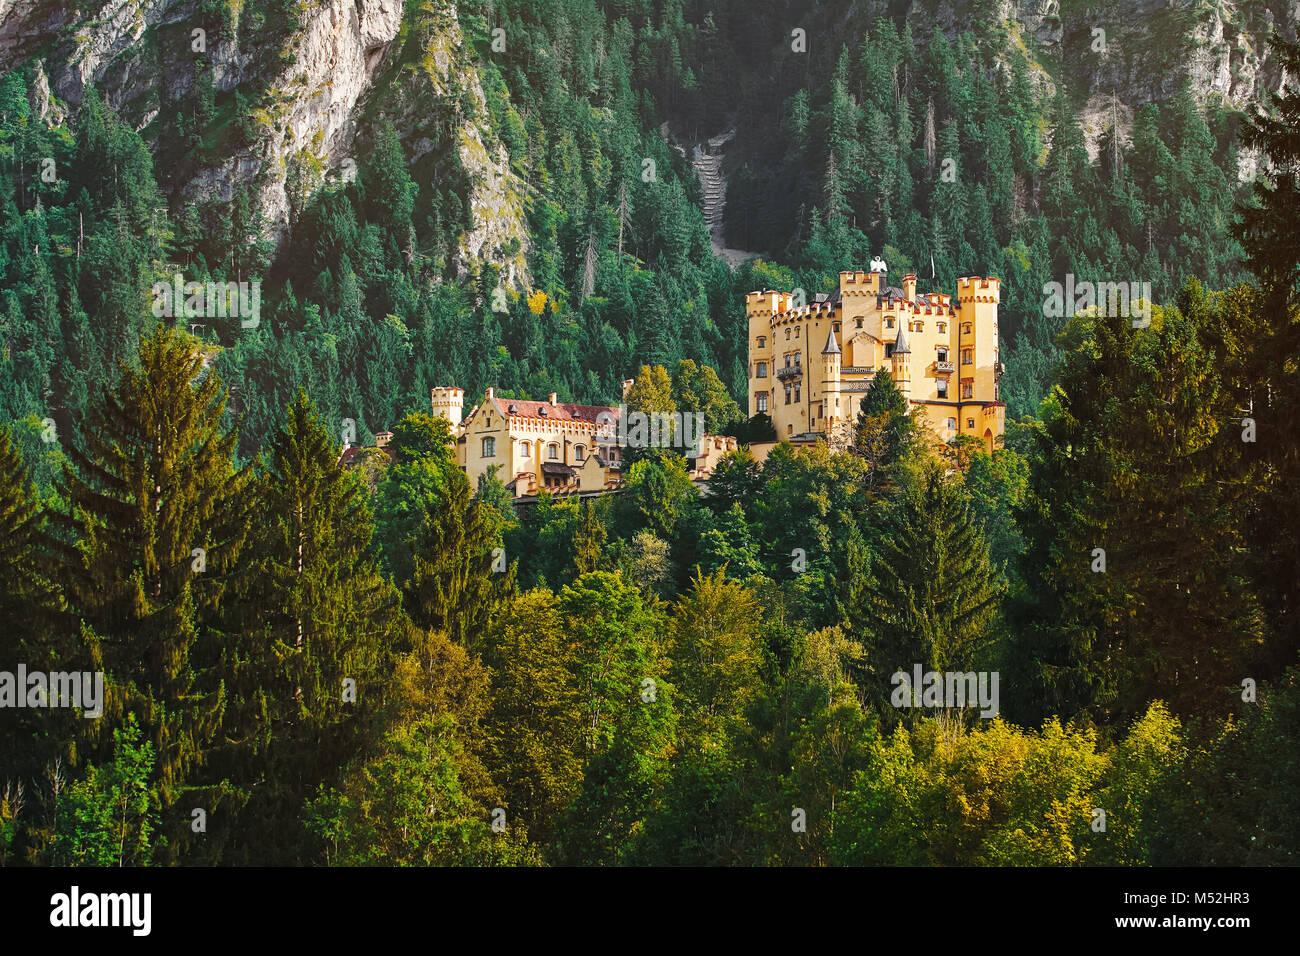 Hohenschwangau Castle in Germany - Stock Image